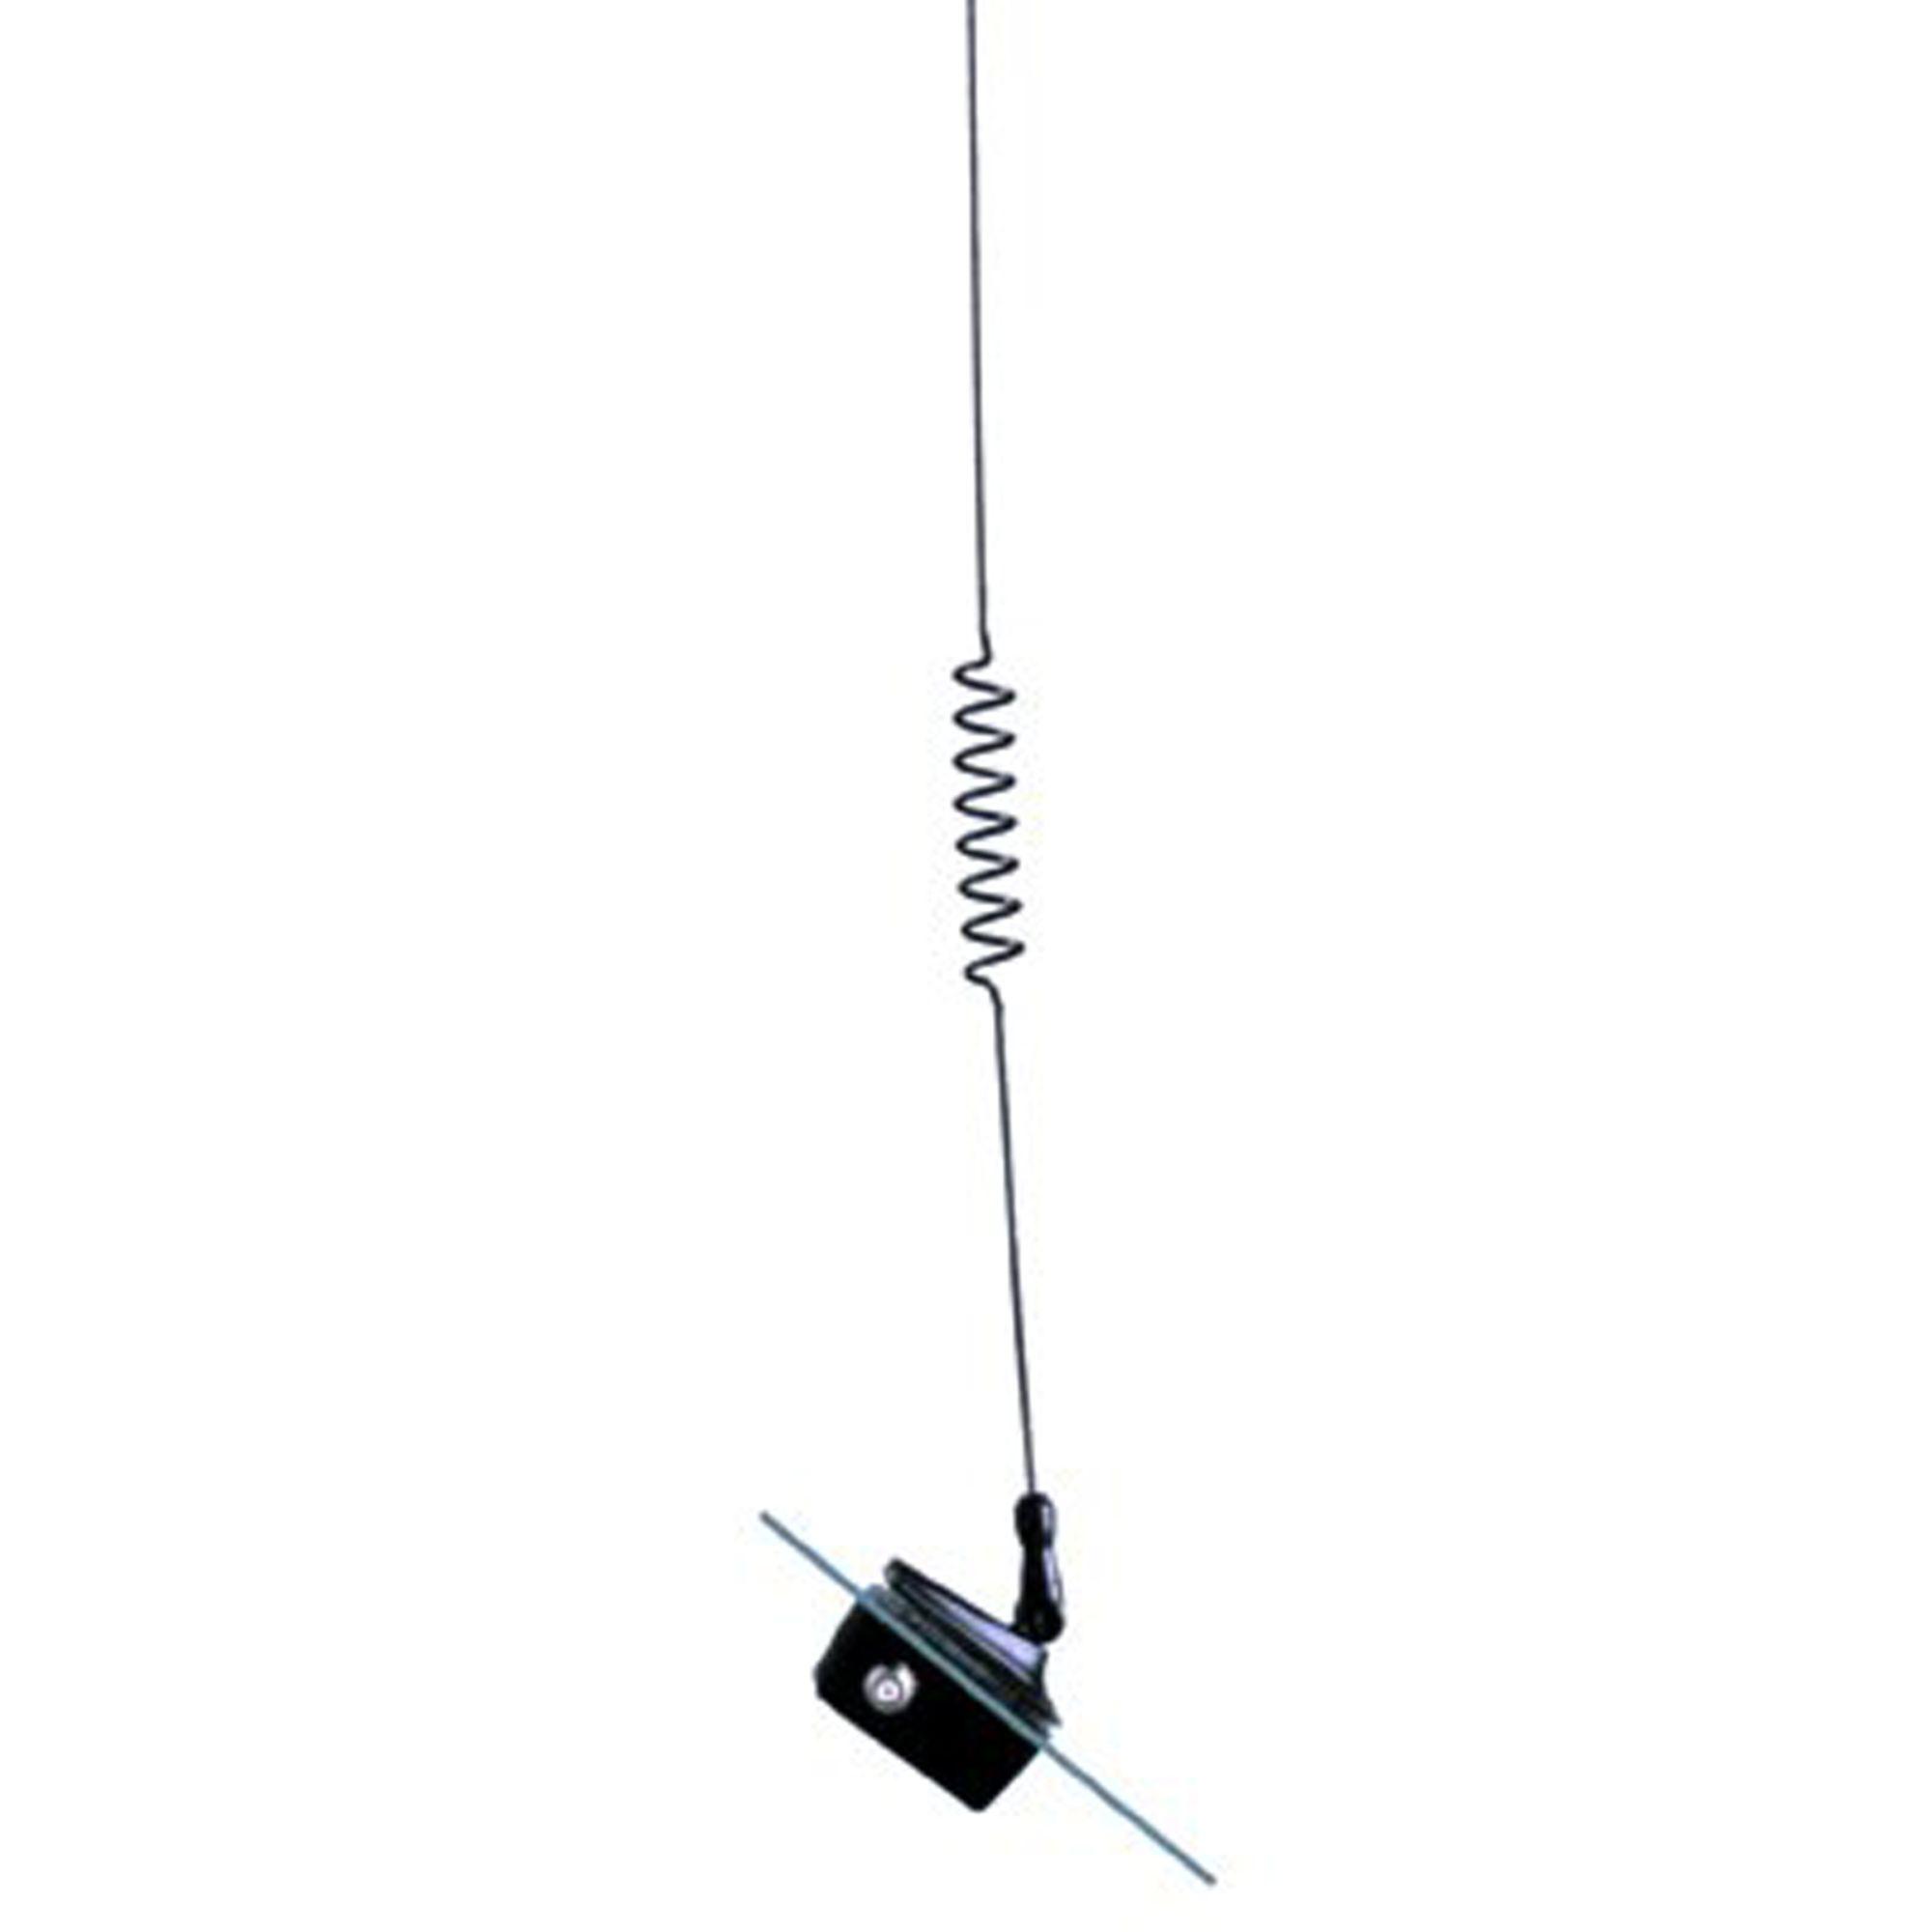 MIDLAND 18-258 Window-Mount CB Antenna